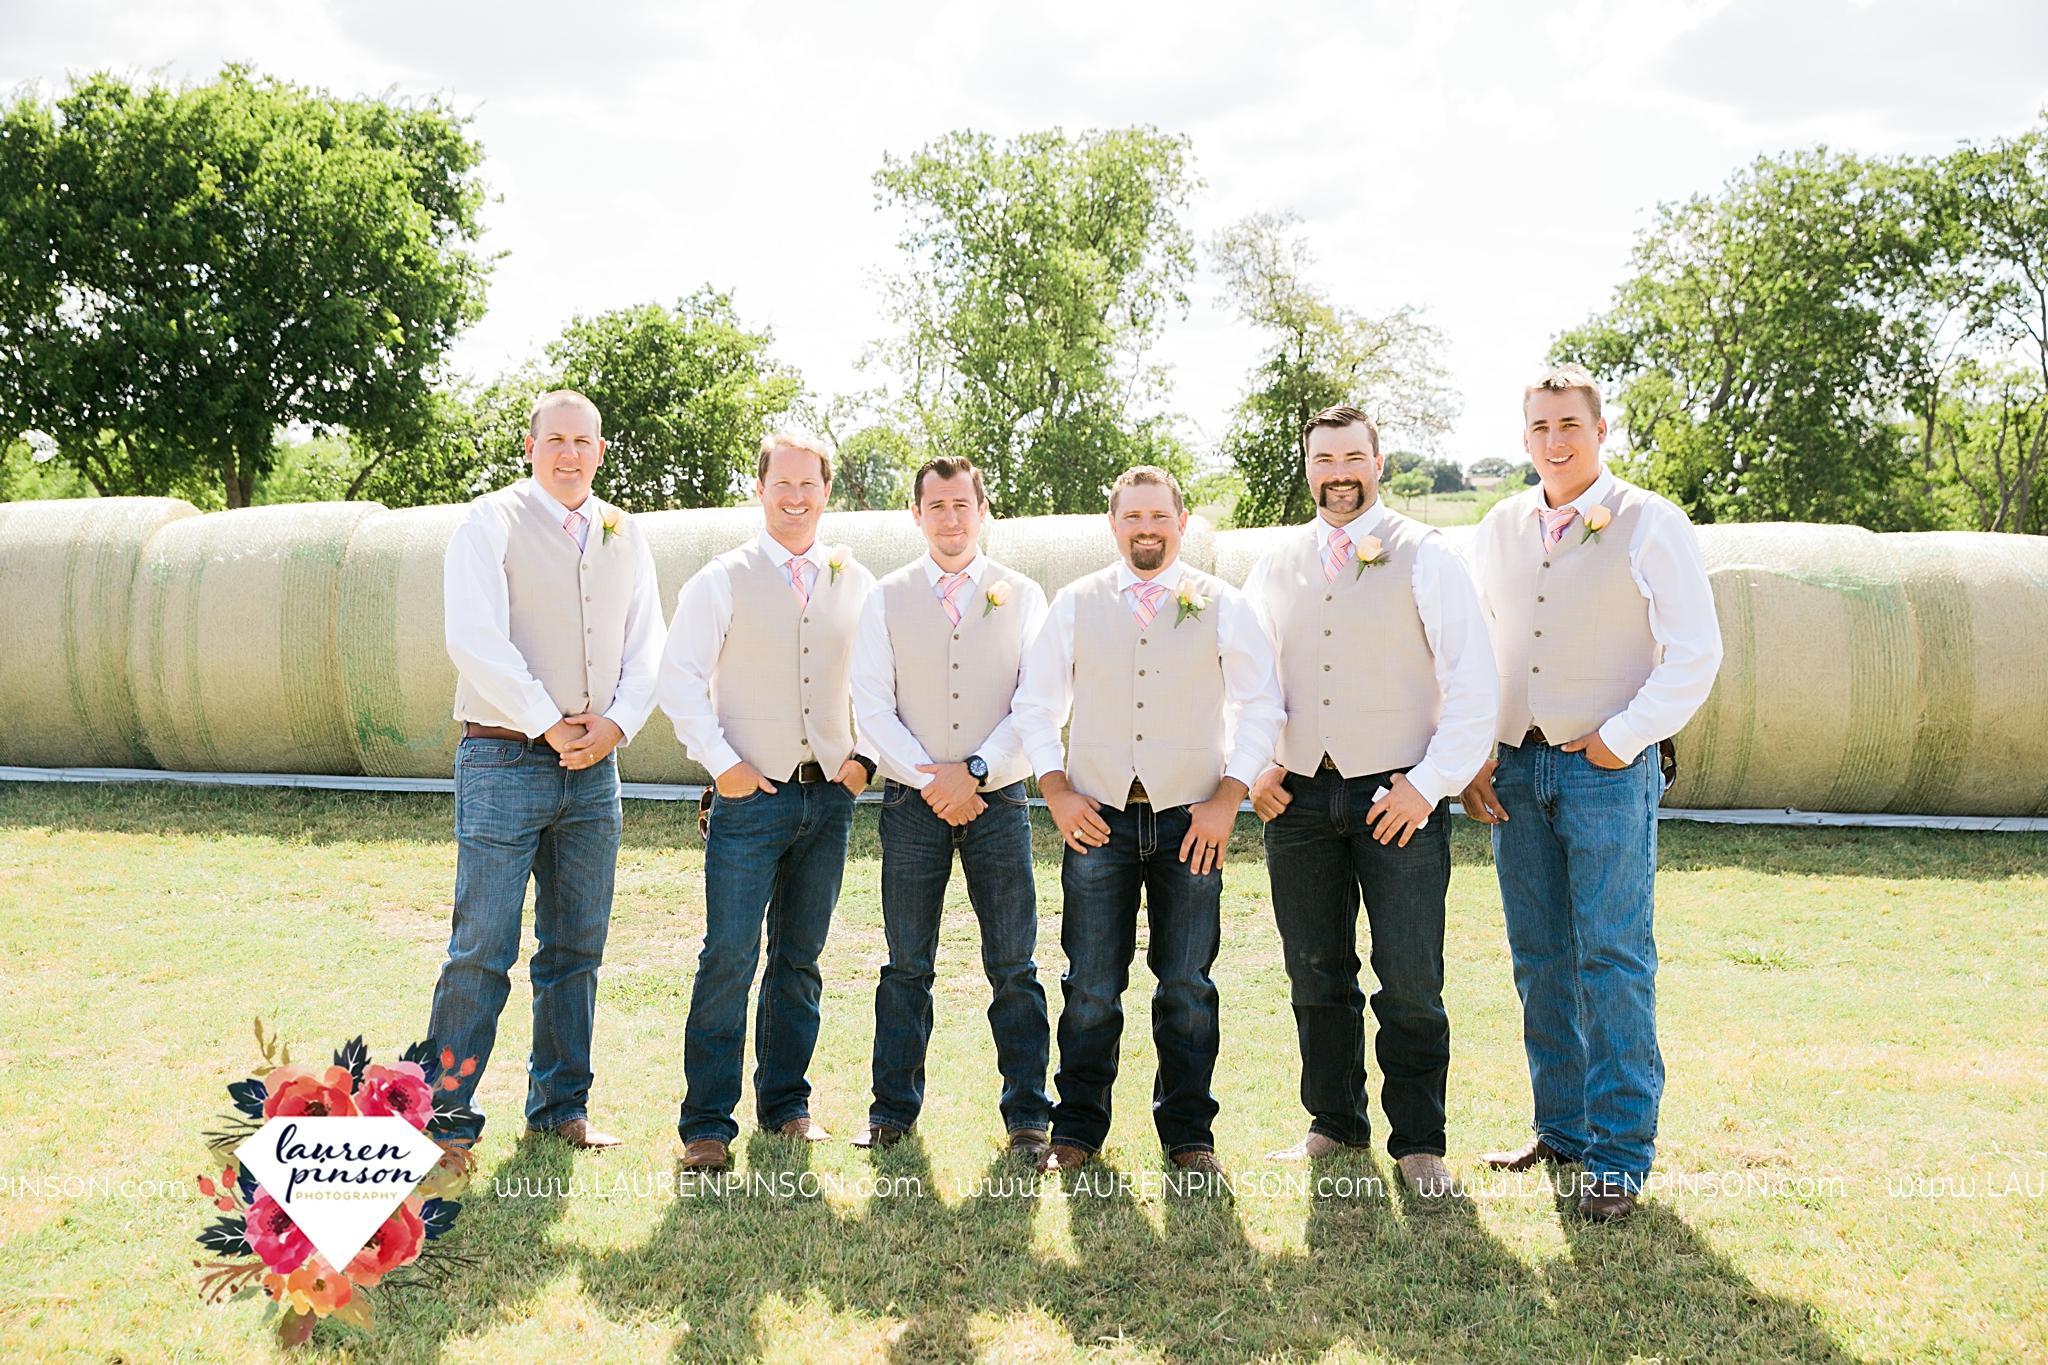 jones-barn-willow-creek-ranch-wedding-in-cleburne-texas-fort-worth-dfw-wichita-falls-wedding-photography_3217.jpg